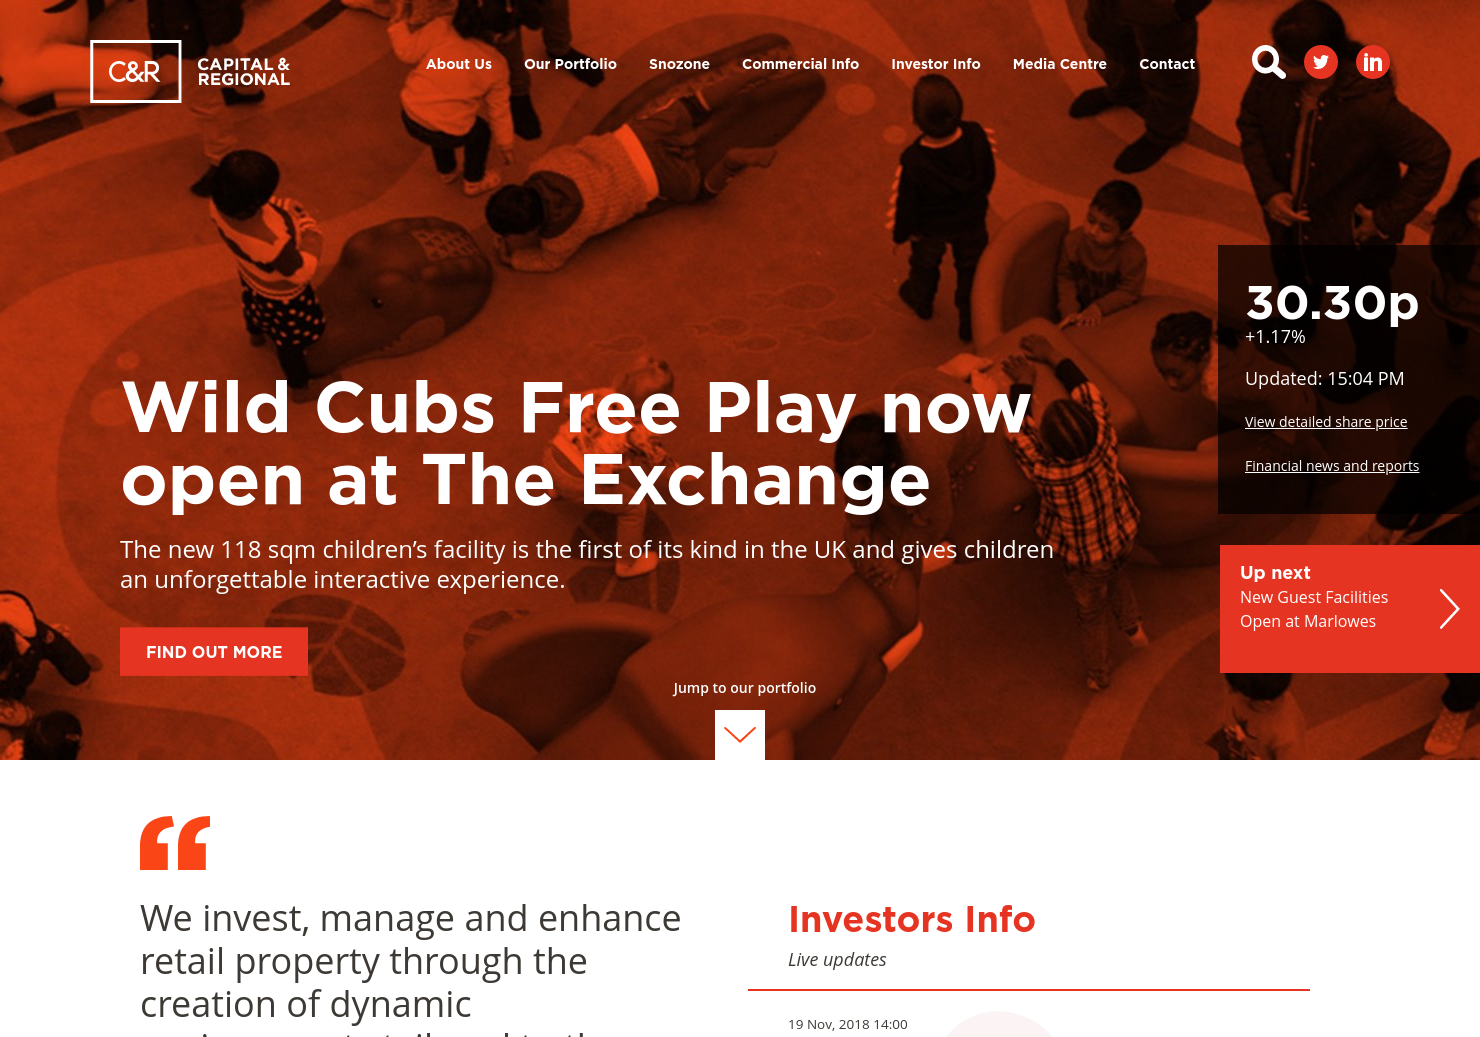 Capital & Regional Home Page